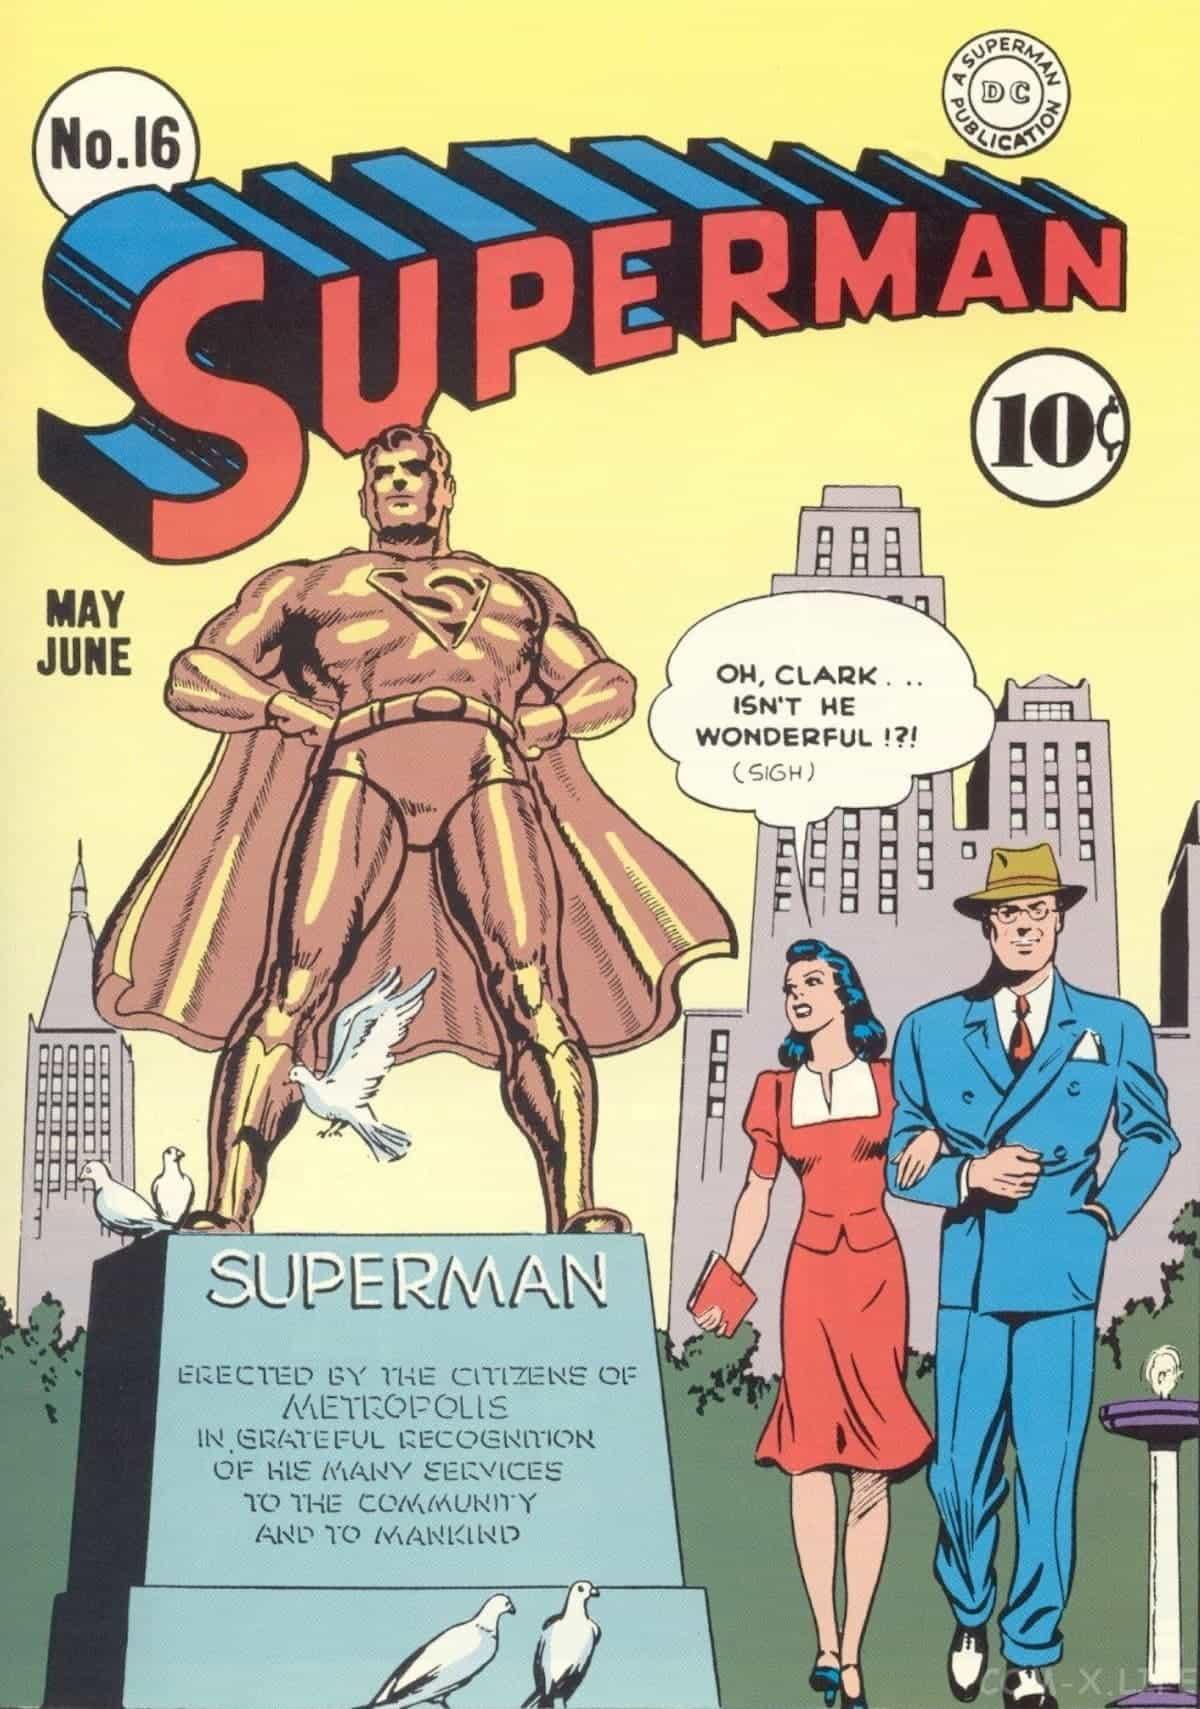 superman nabokov poesia